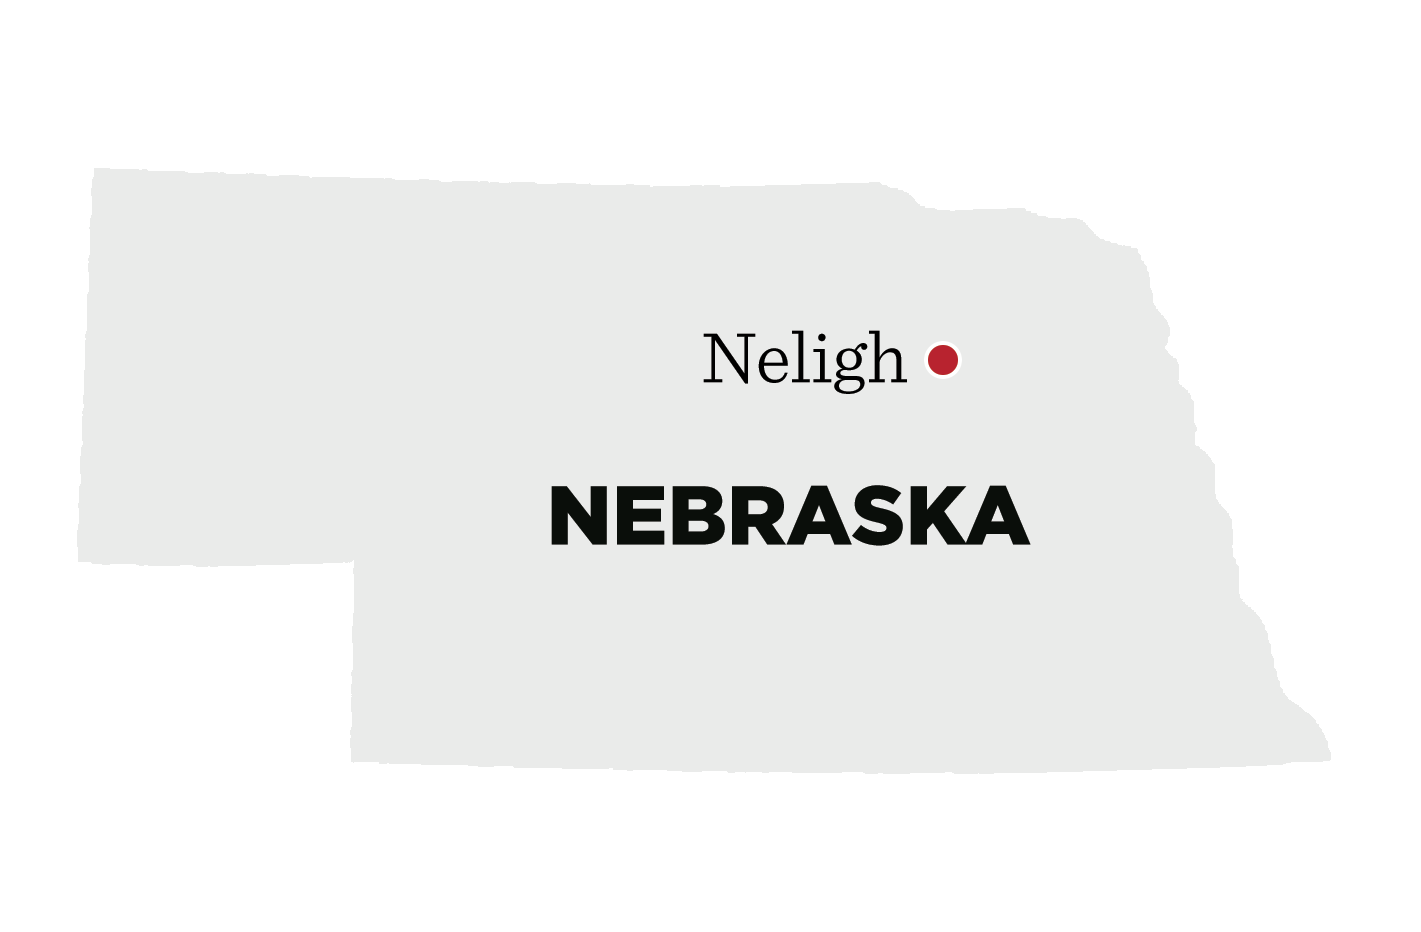 Neligh, Nebraska